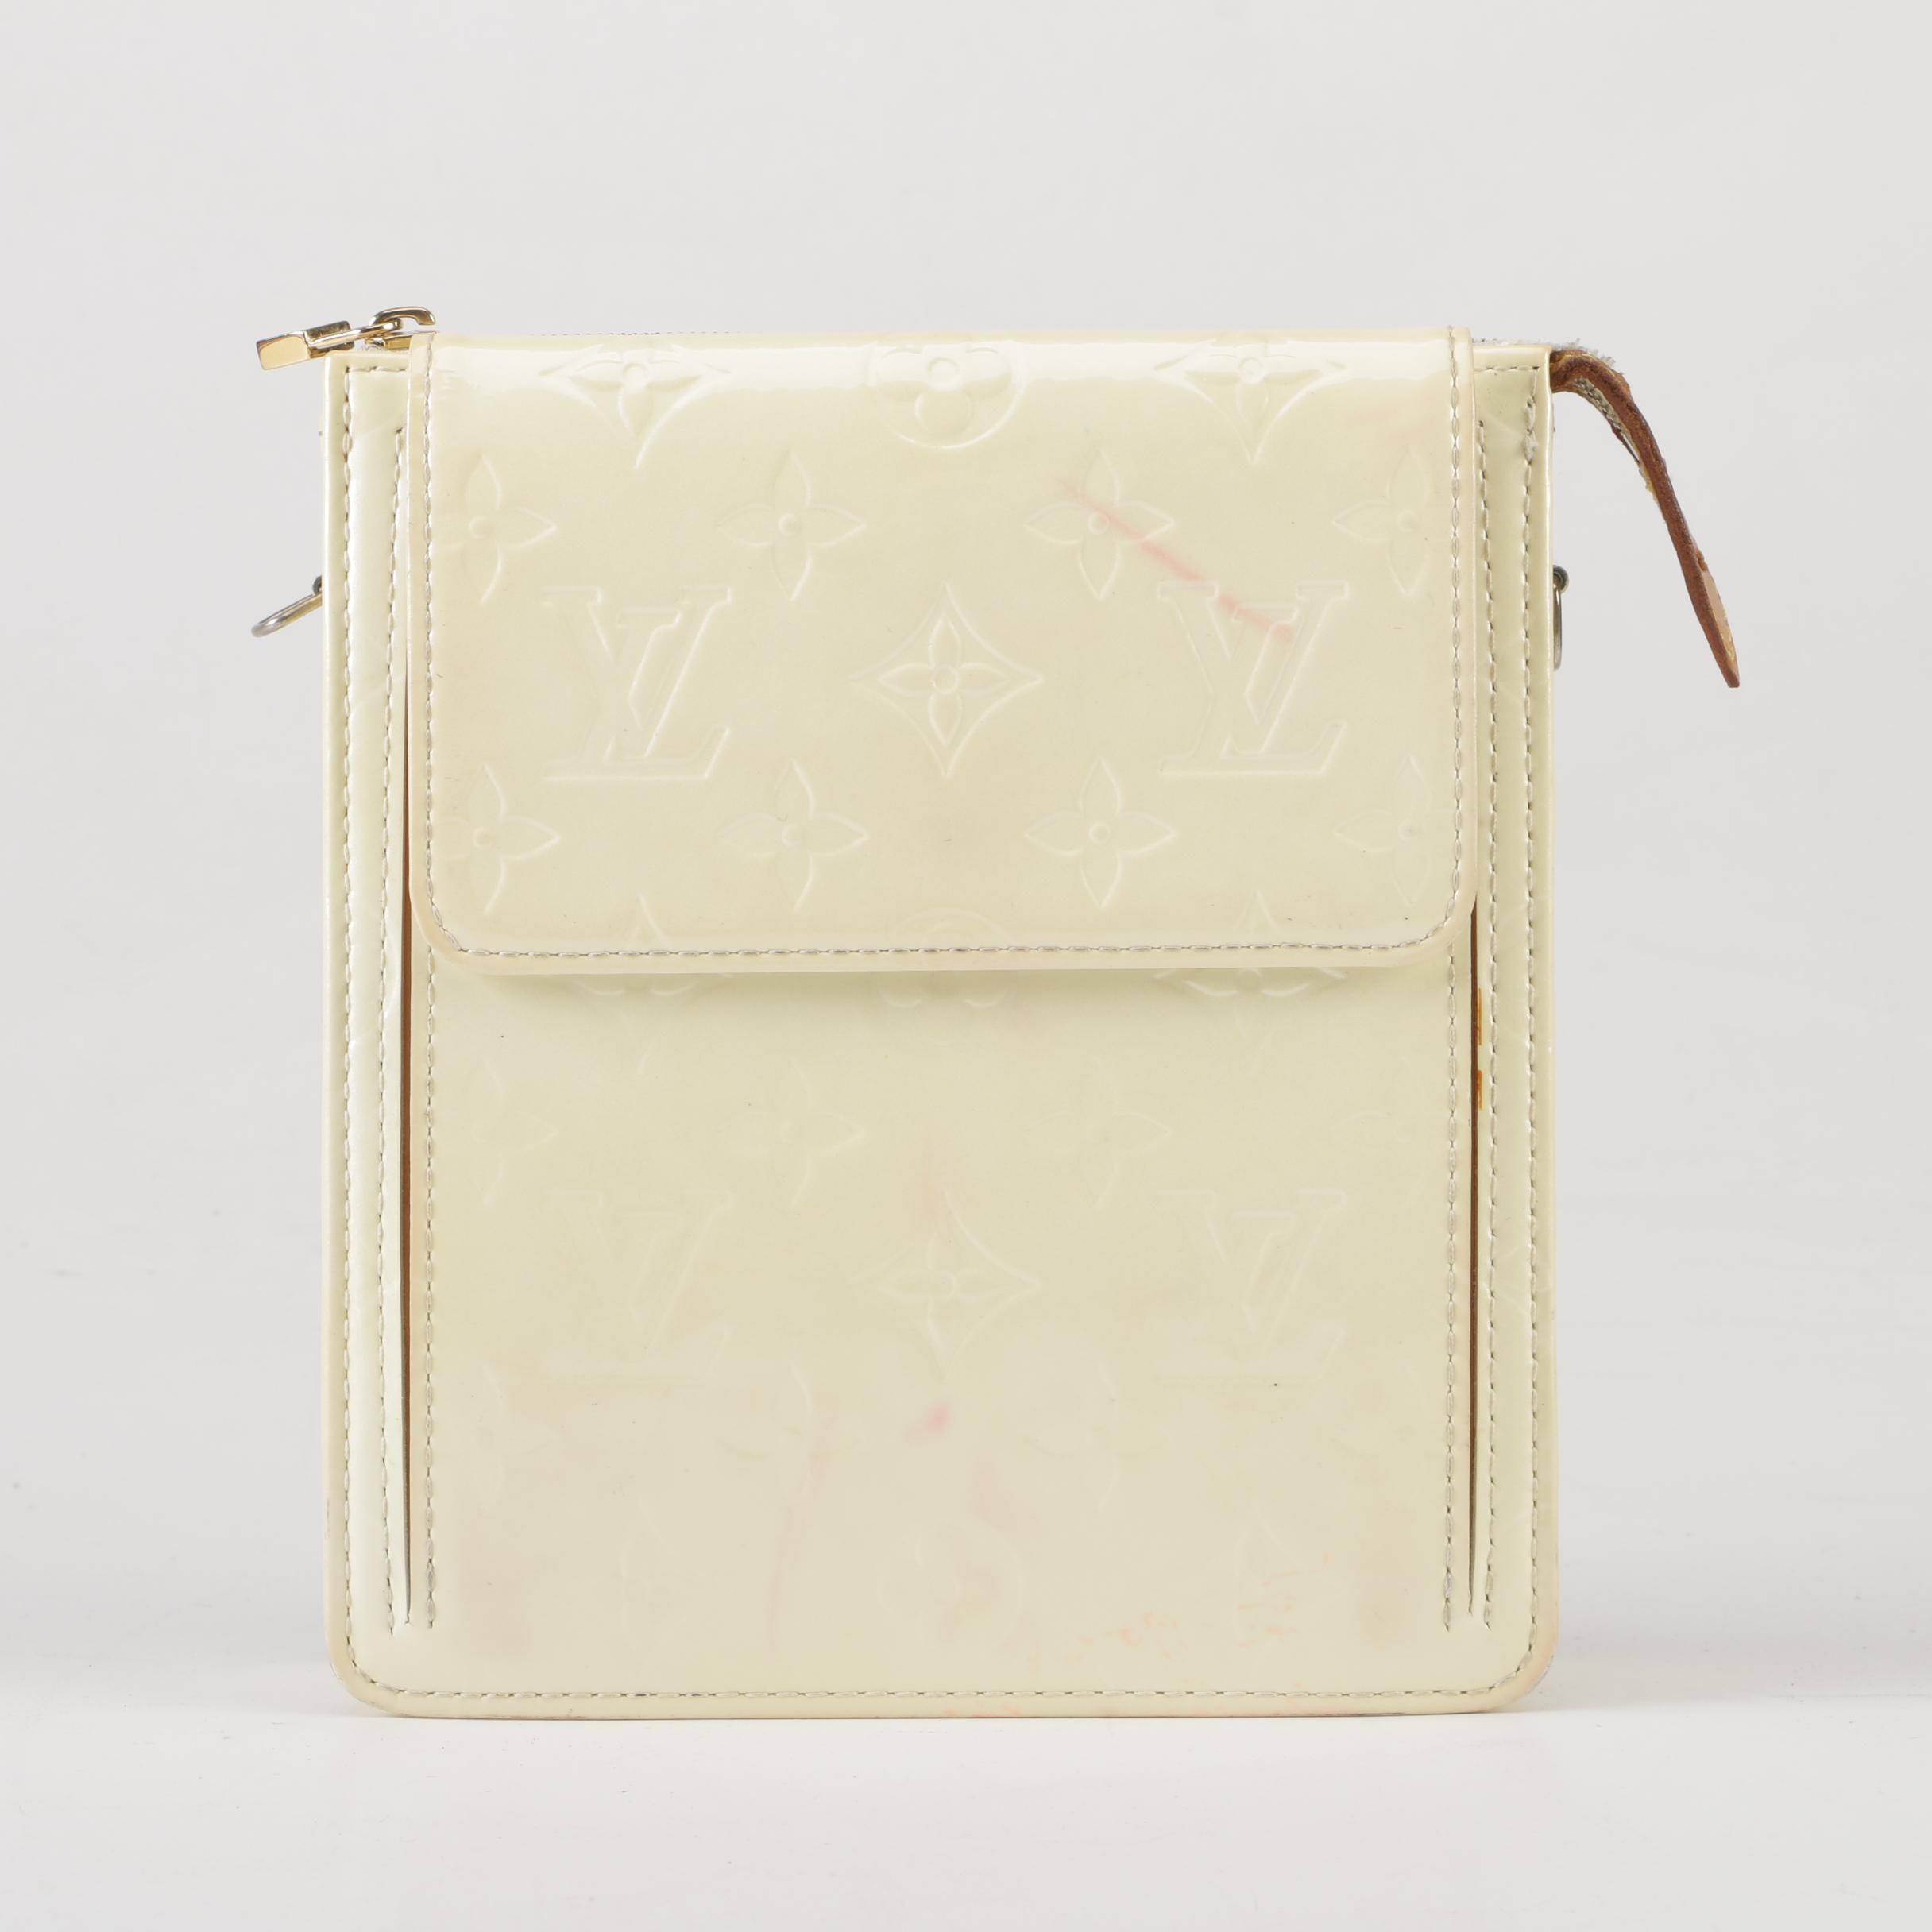 2005 Louis Vuitton Paris Marshmallow Monogram Vernis Mott Bag